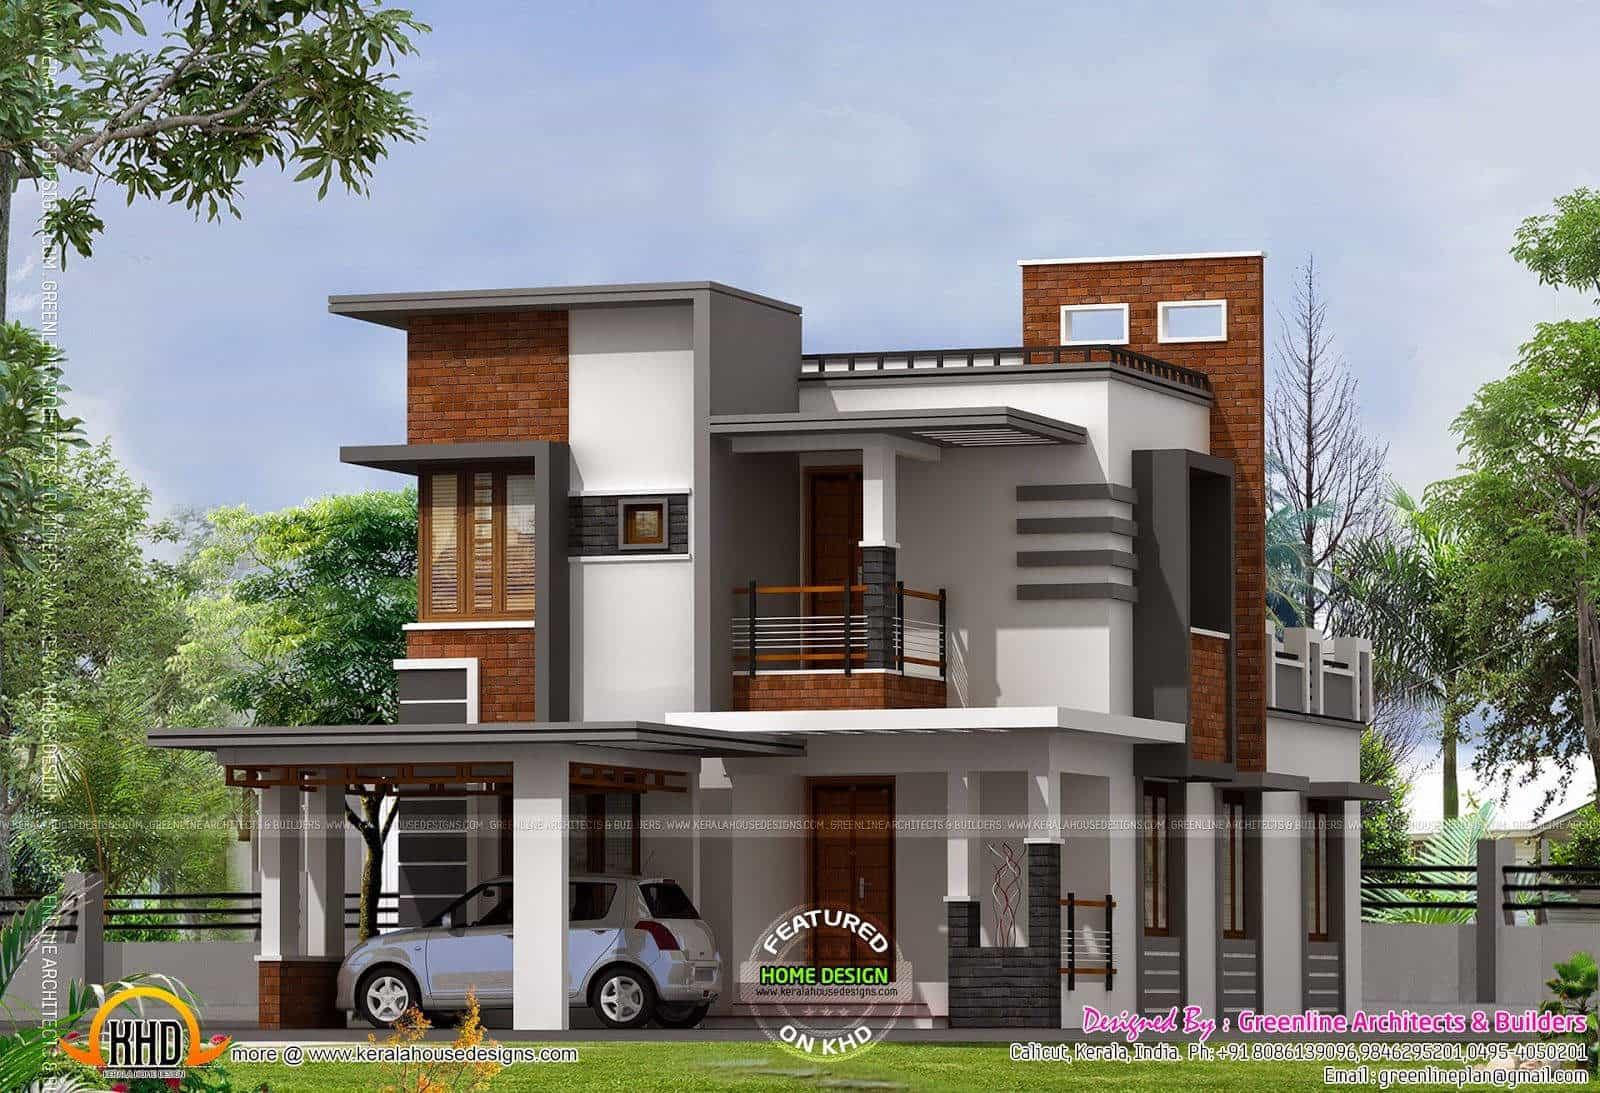 Home Design Tech Photos, Najafgarh, Delhi- Pictures & Images Gallery ...